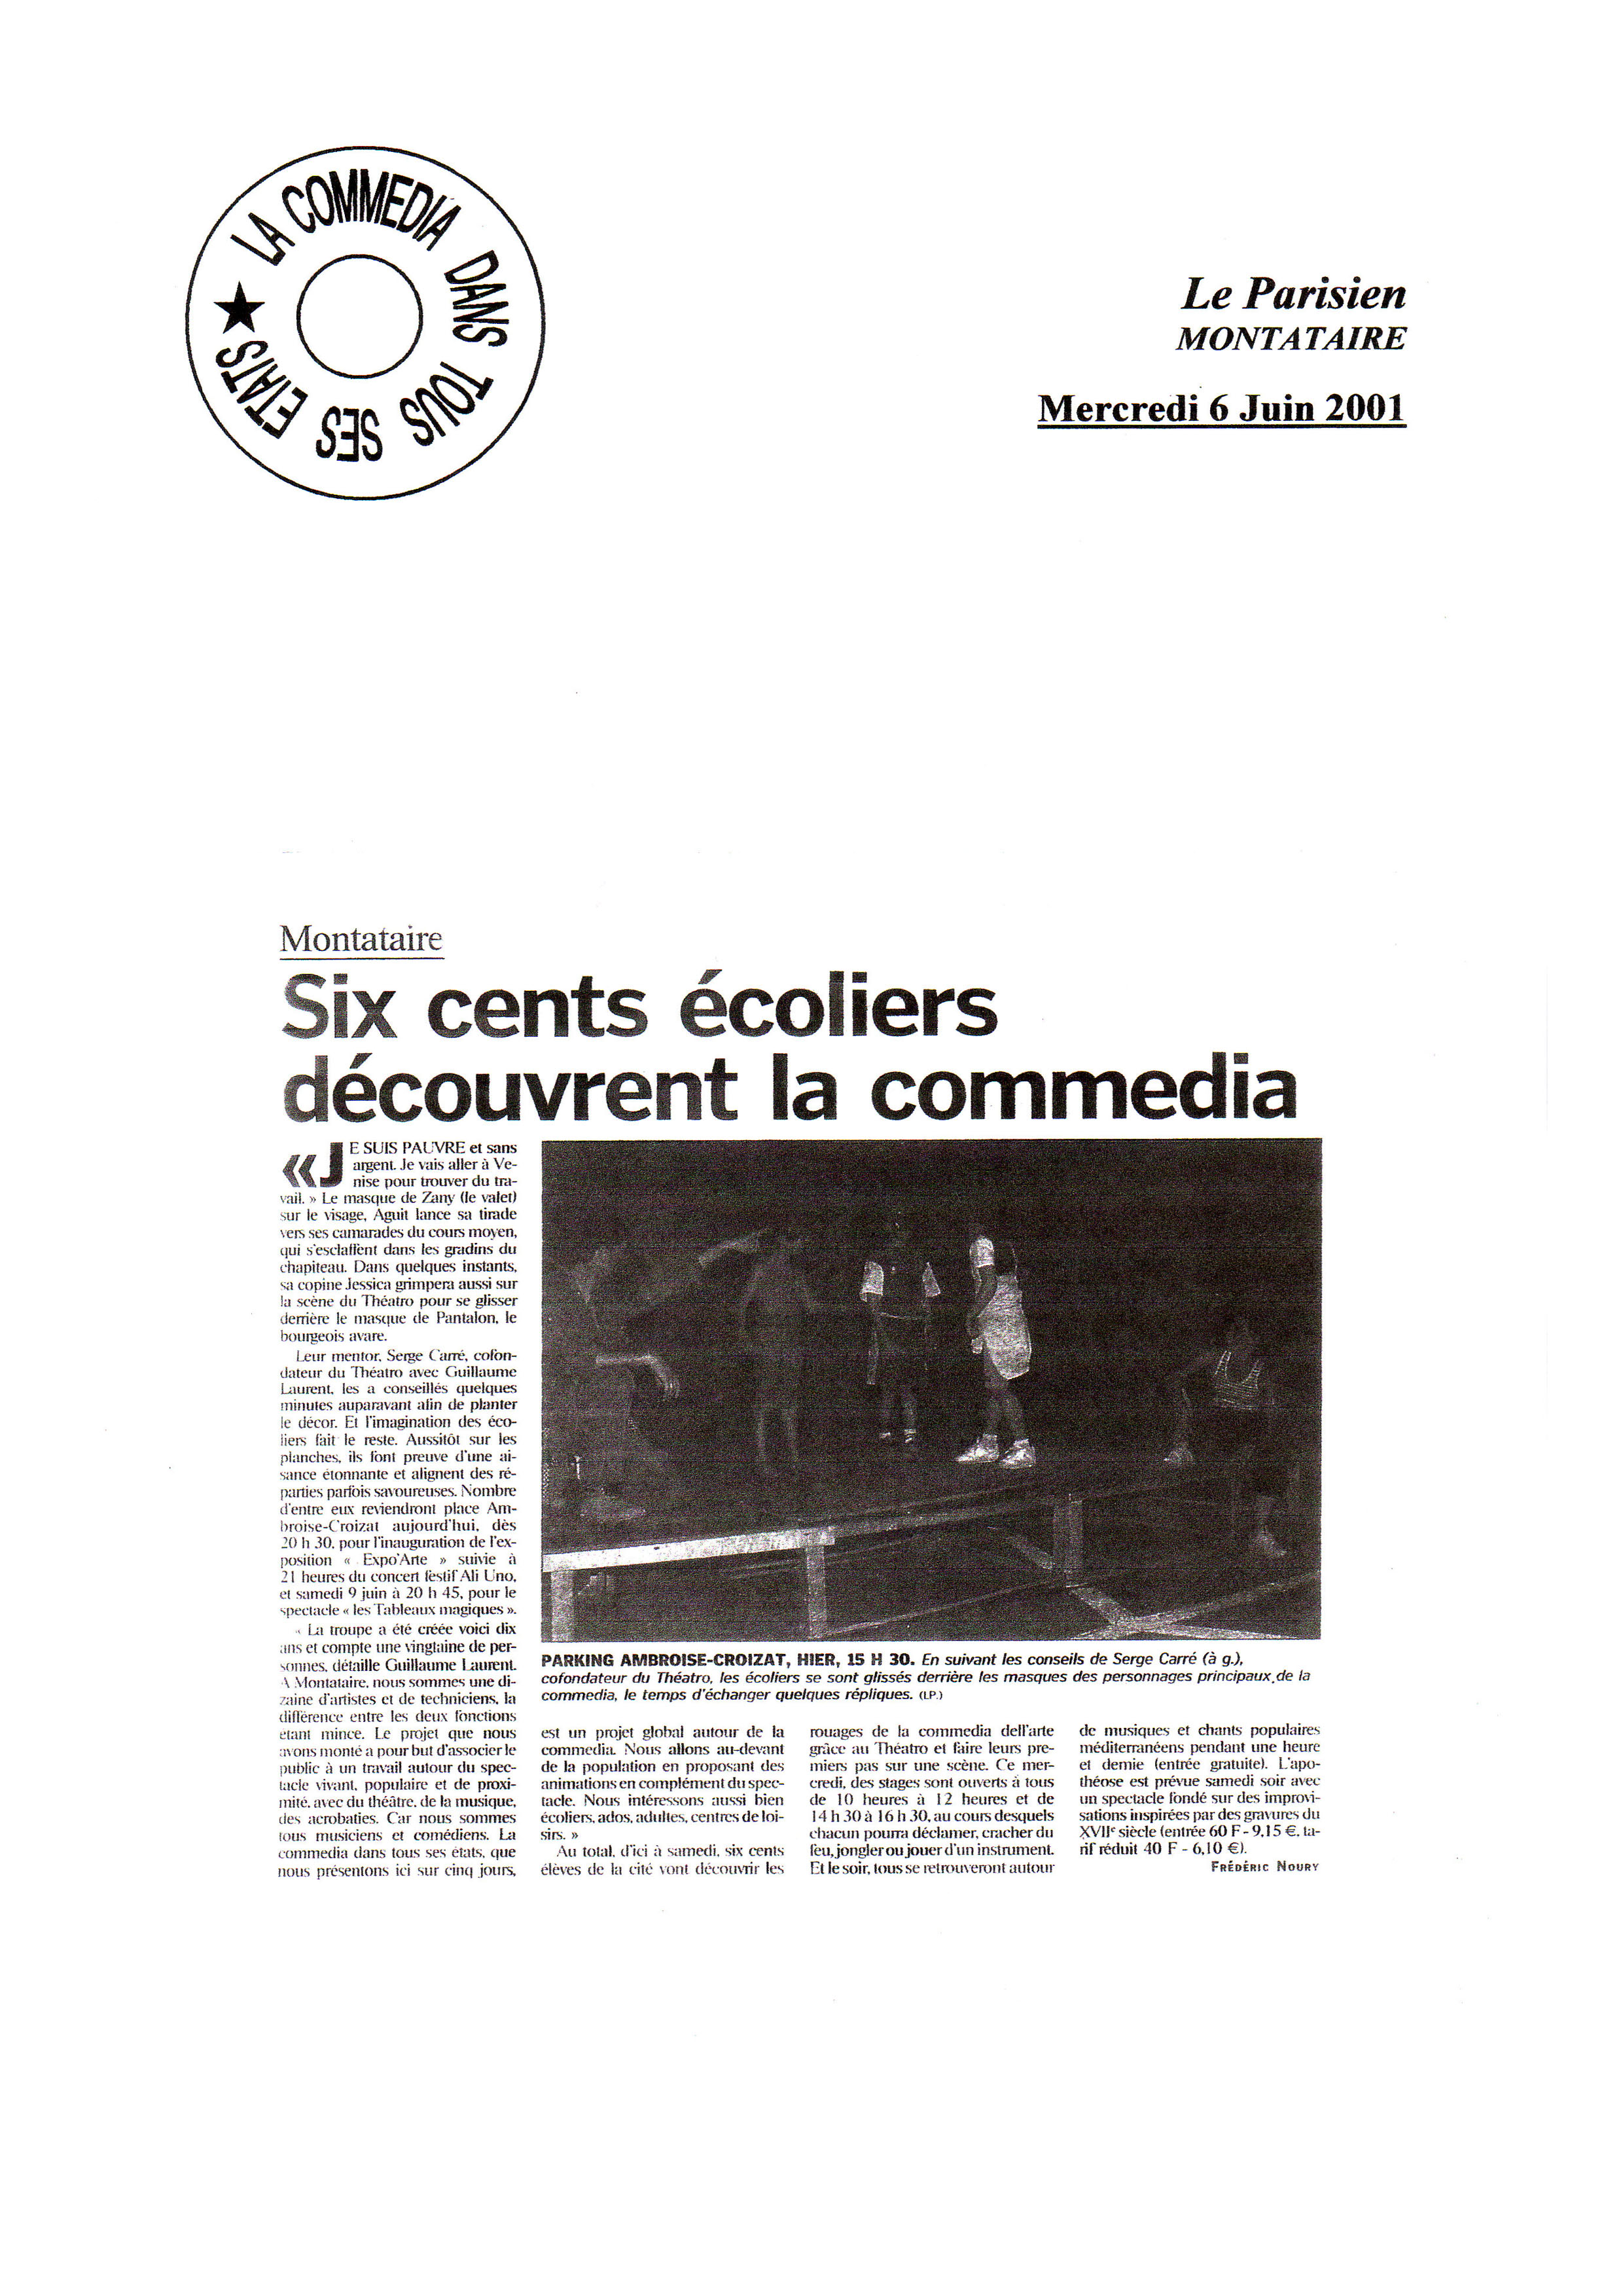 Montataire 06.06.01.jpg